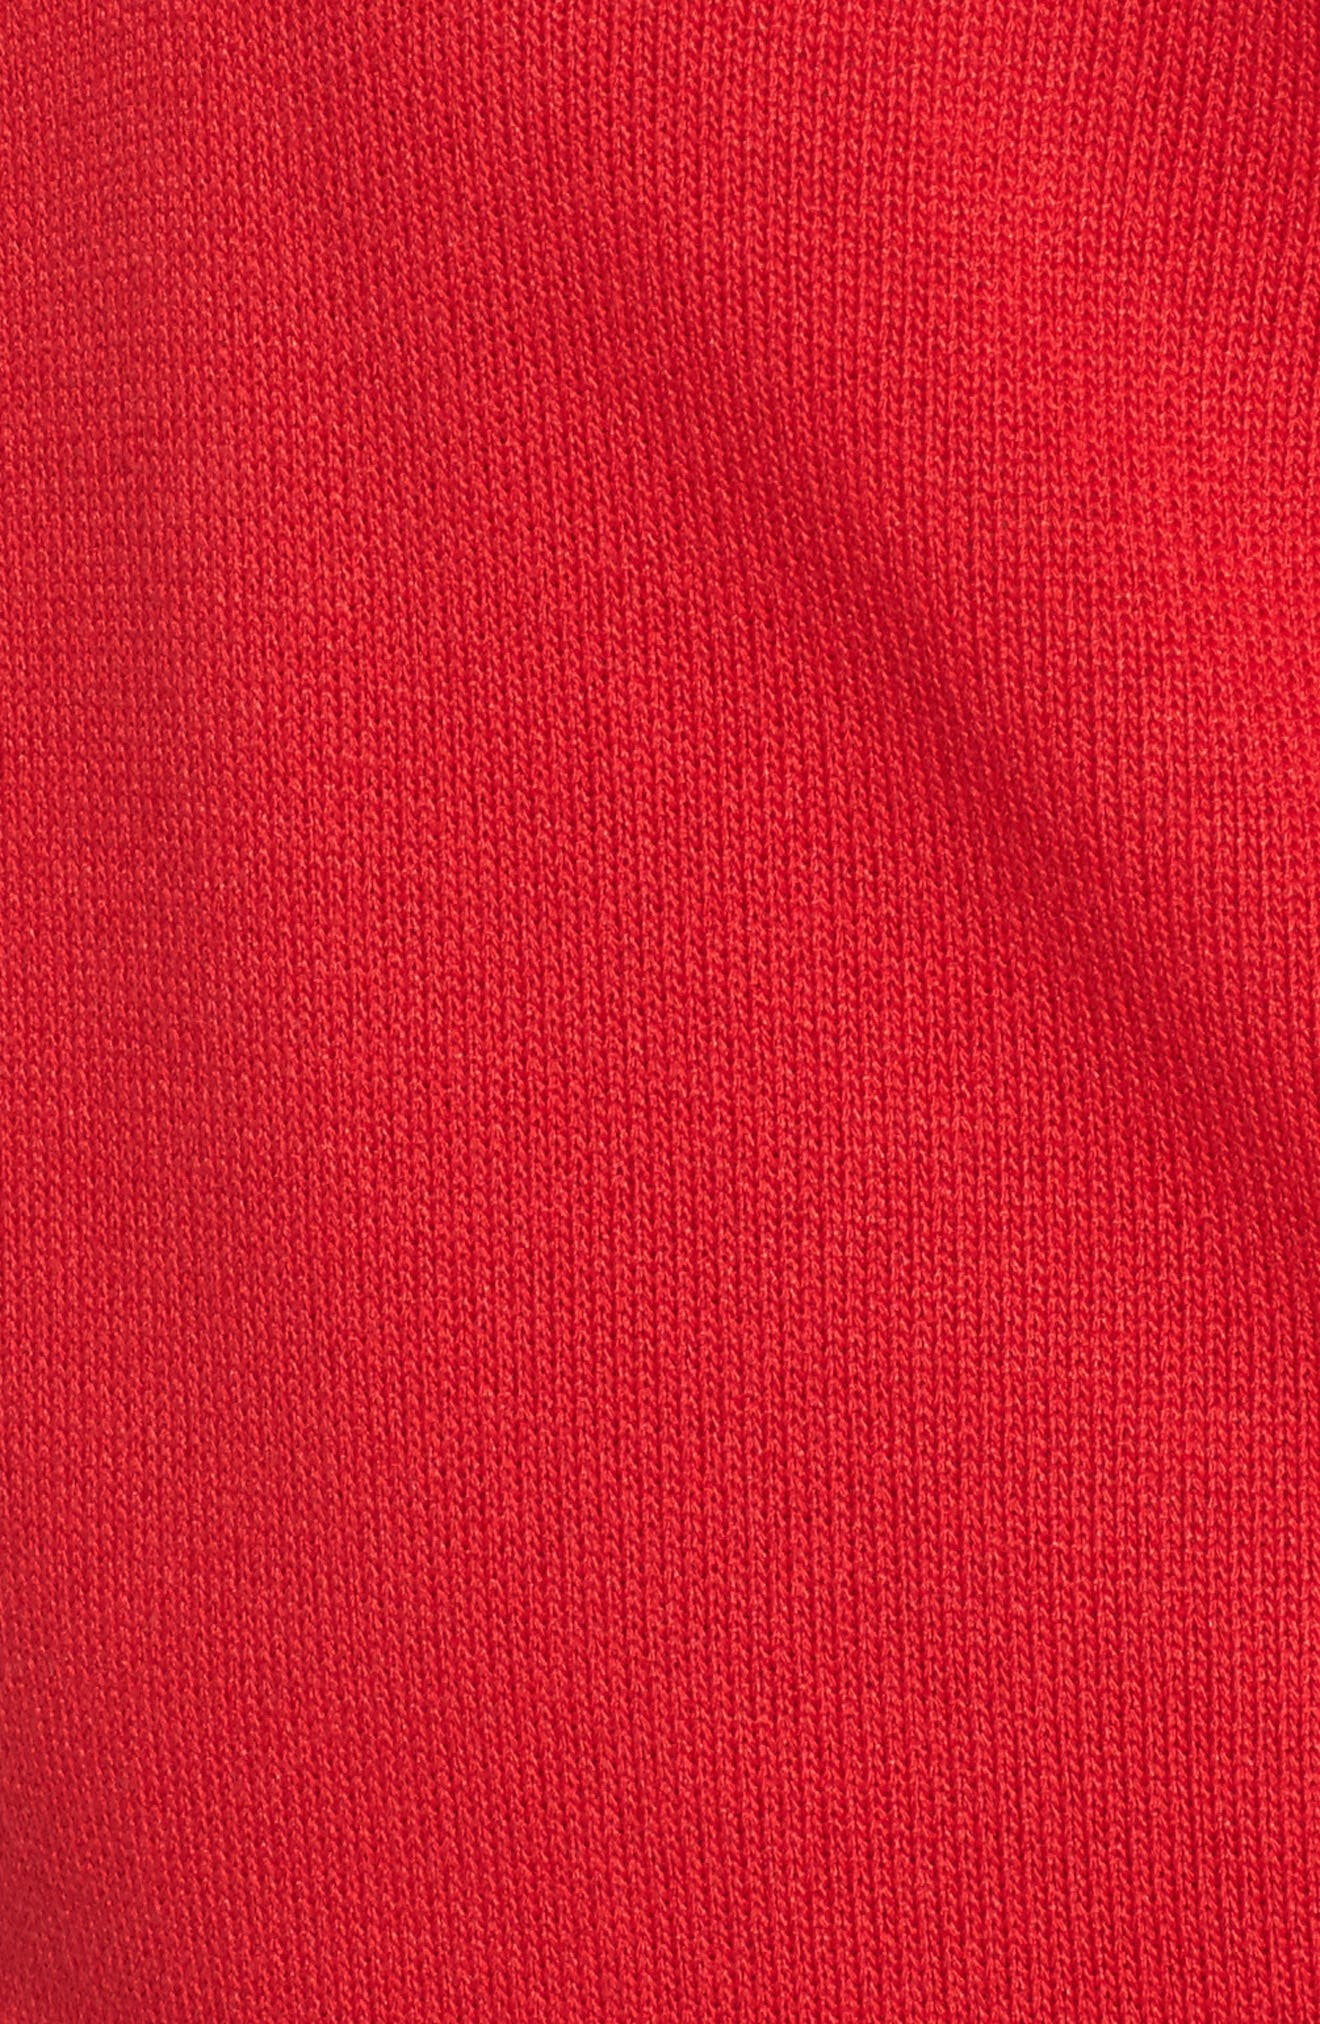 Stripe Sweater,                             Alternate thumbnail 5, color,                             Red/ Black/ White